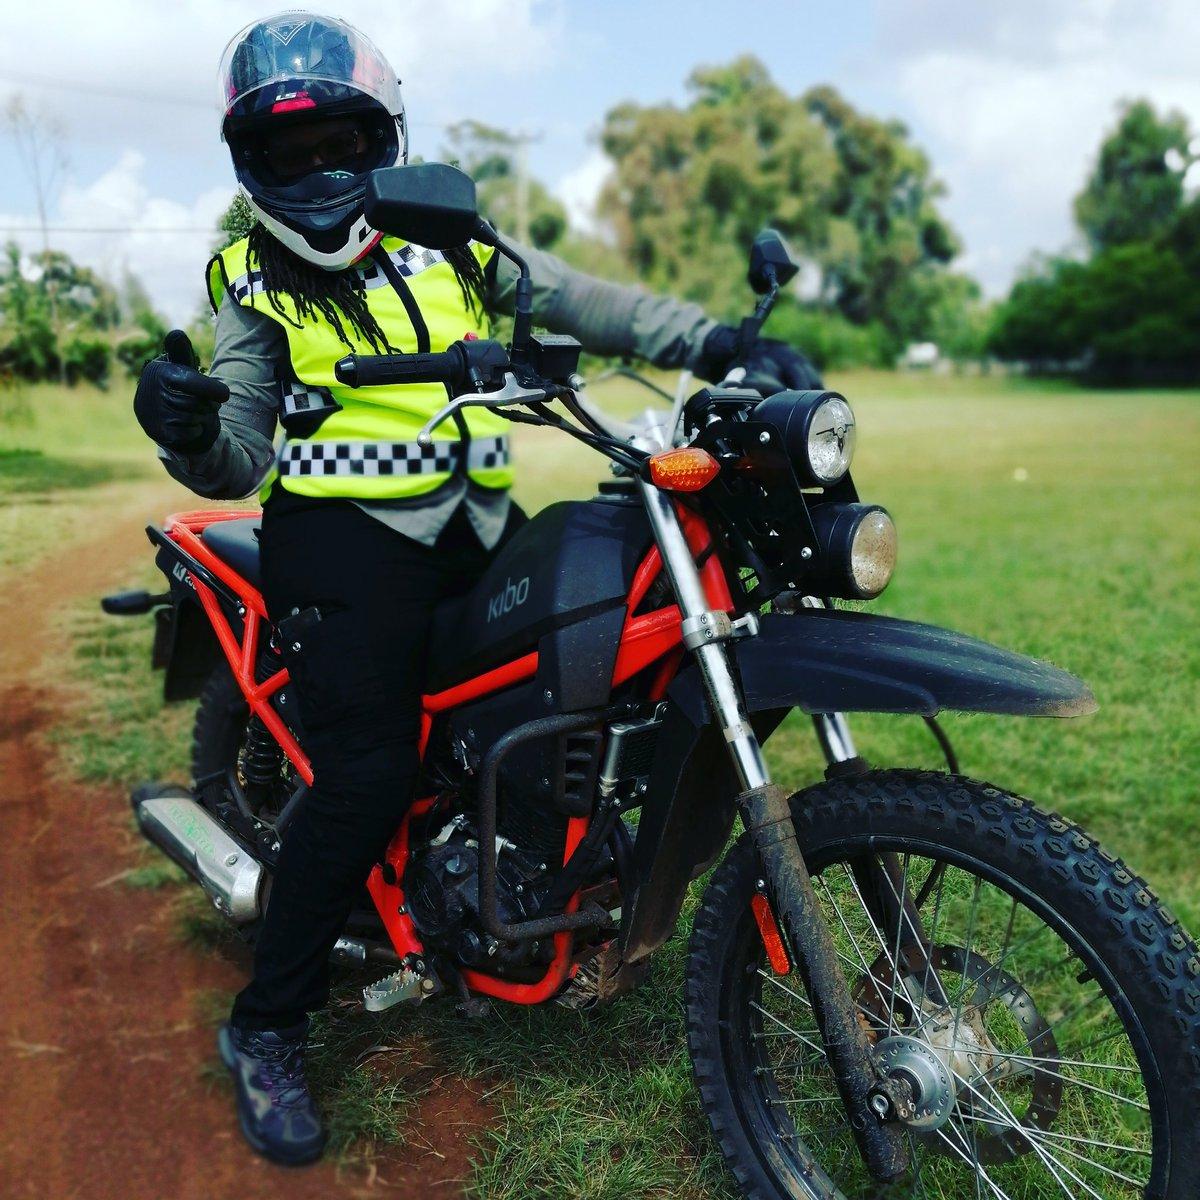 Sally wa Makibo, the KIBO K250 looks great on you #girlswhoride #girlrider #girlsdoitbetter #bikerchick #kibok250 @kiboafricapic.twitter.com/DbQsPZ2ddT